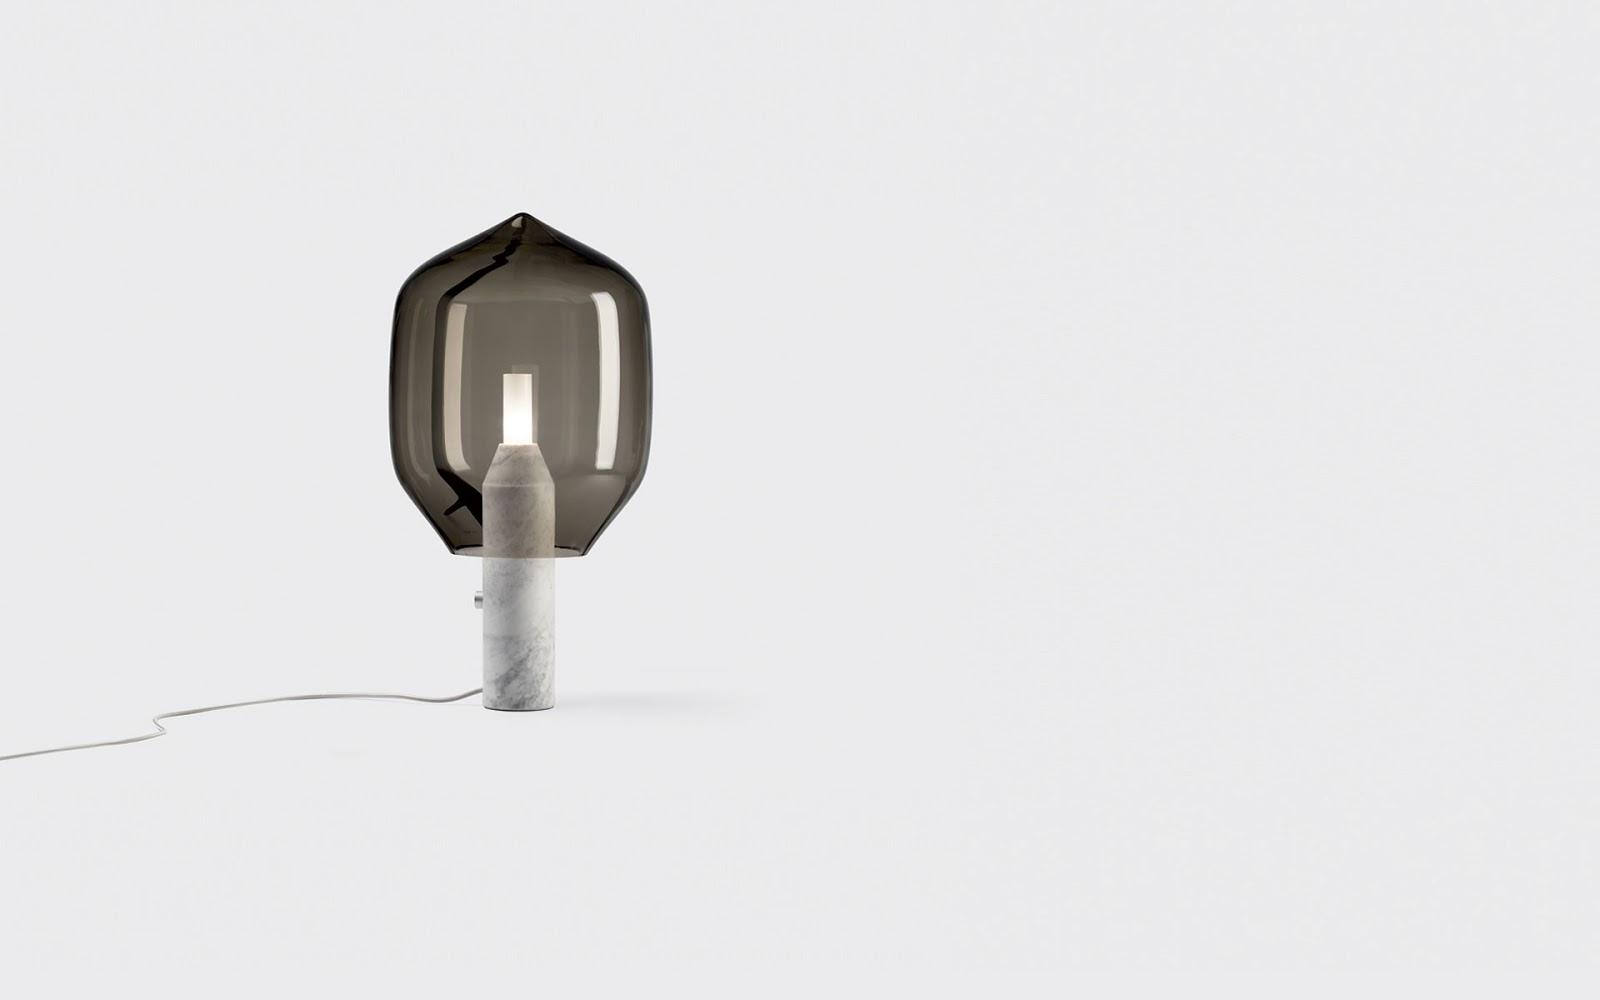 Purefecto: Lighthouse Lamp by Ronan & Erwan Bouroullec